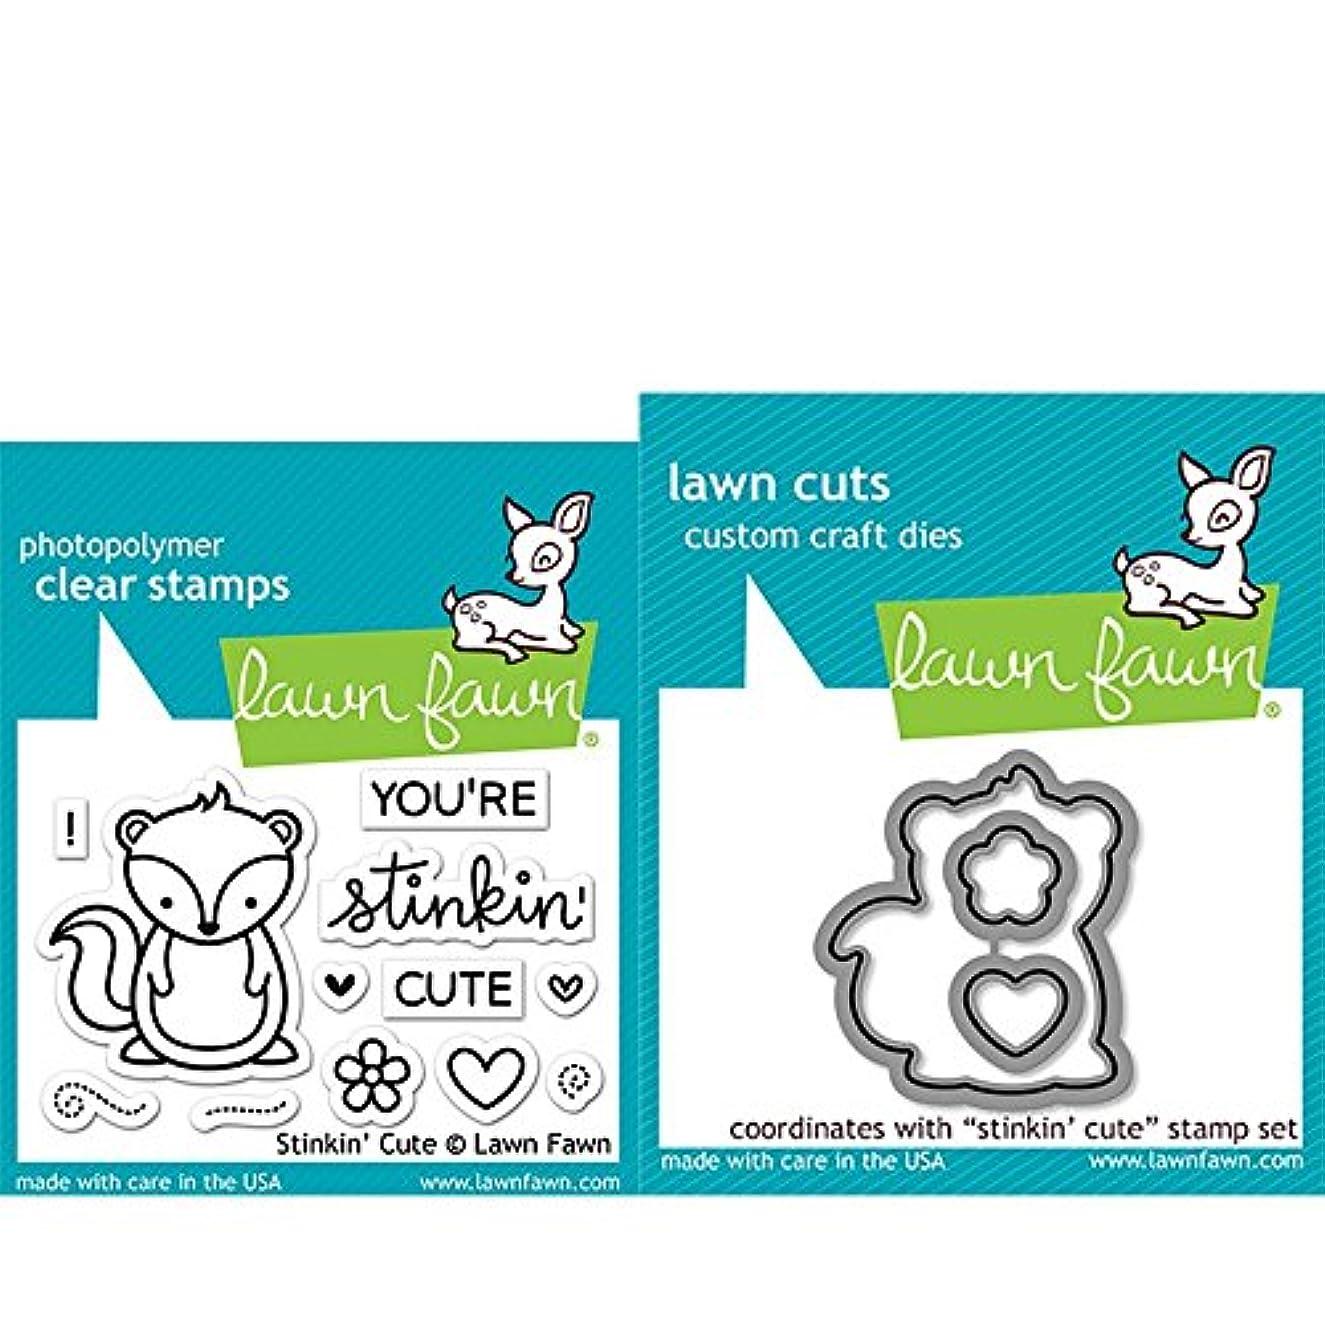 Lawn Fawn Clear Stamp & Die Set - Stinkin' Cute LF1022 & LF1023